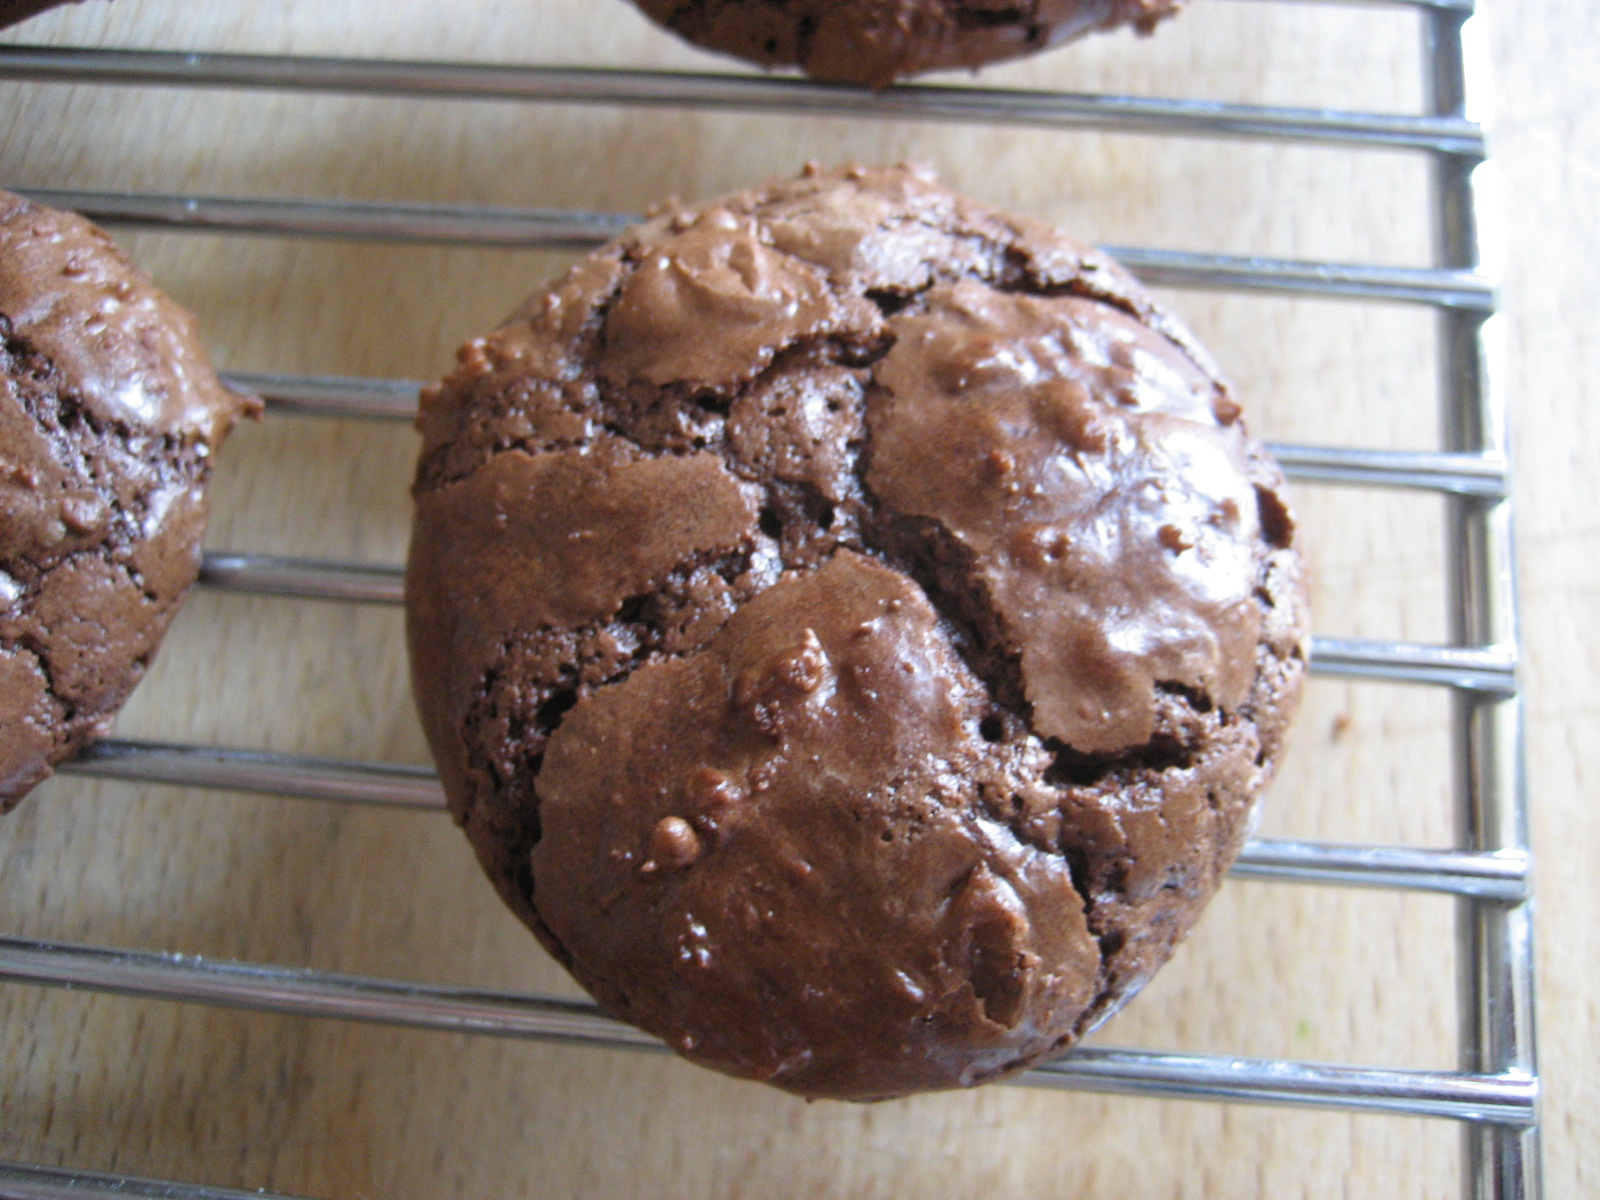 the nifty nest: Chocolate Meringue Cookies